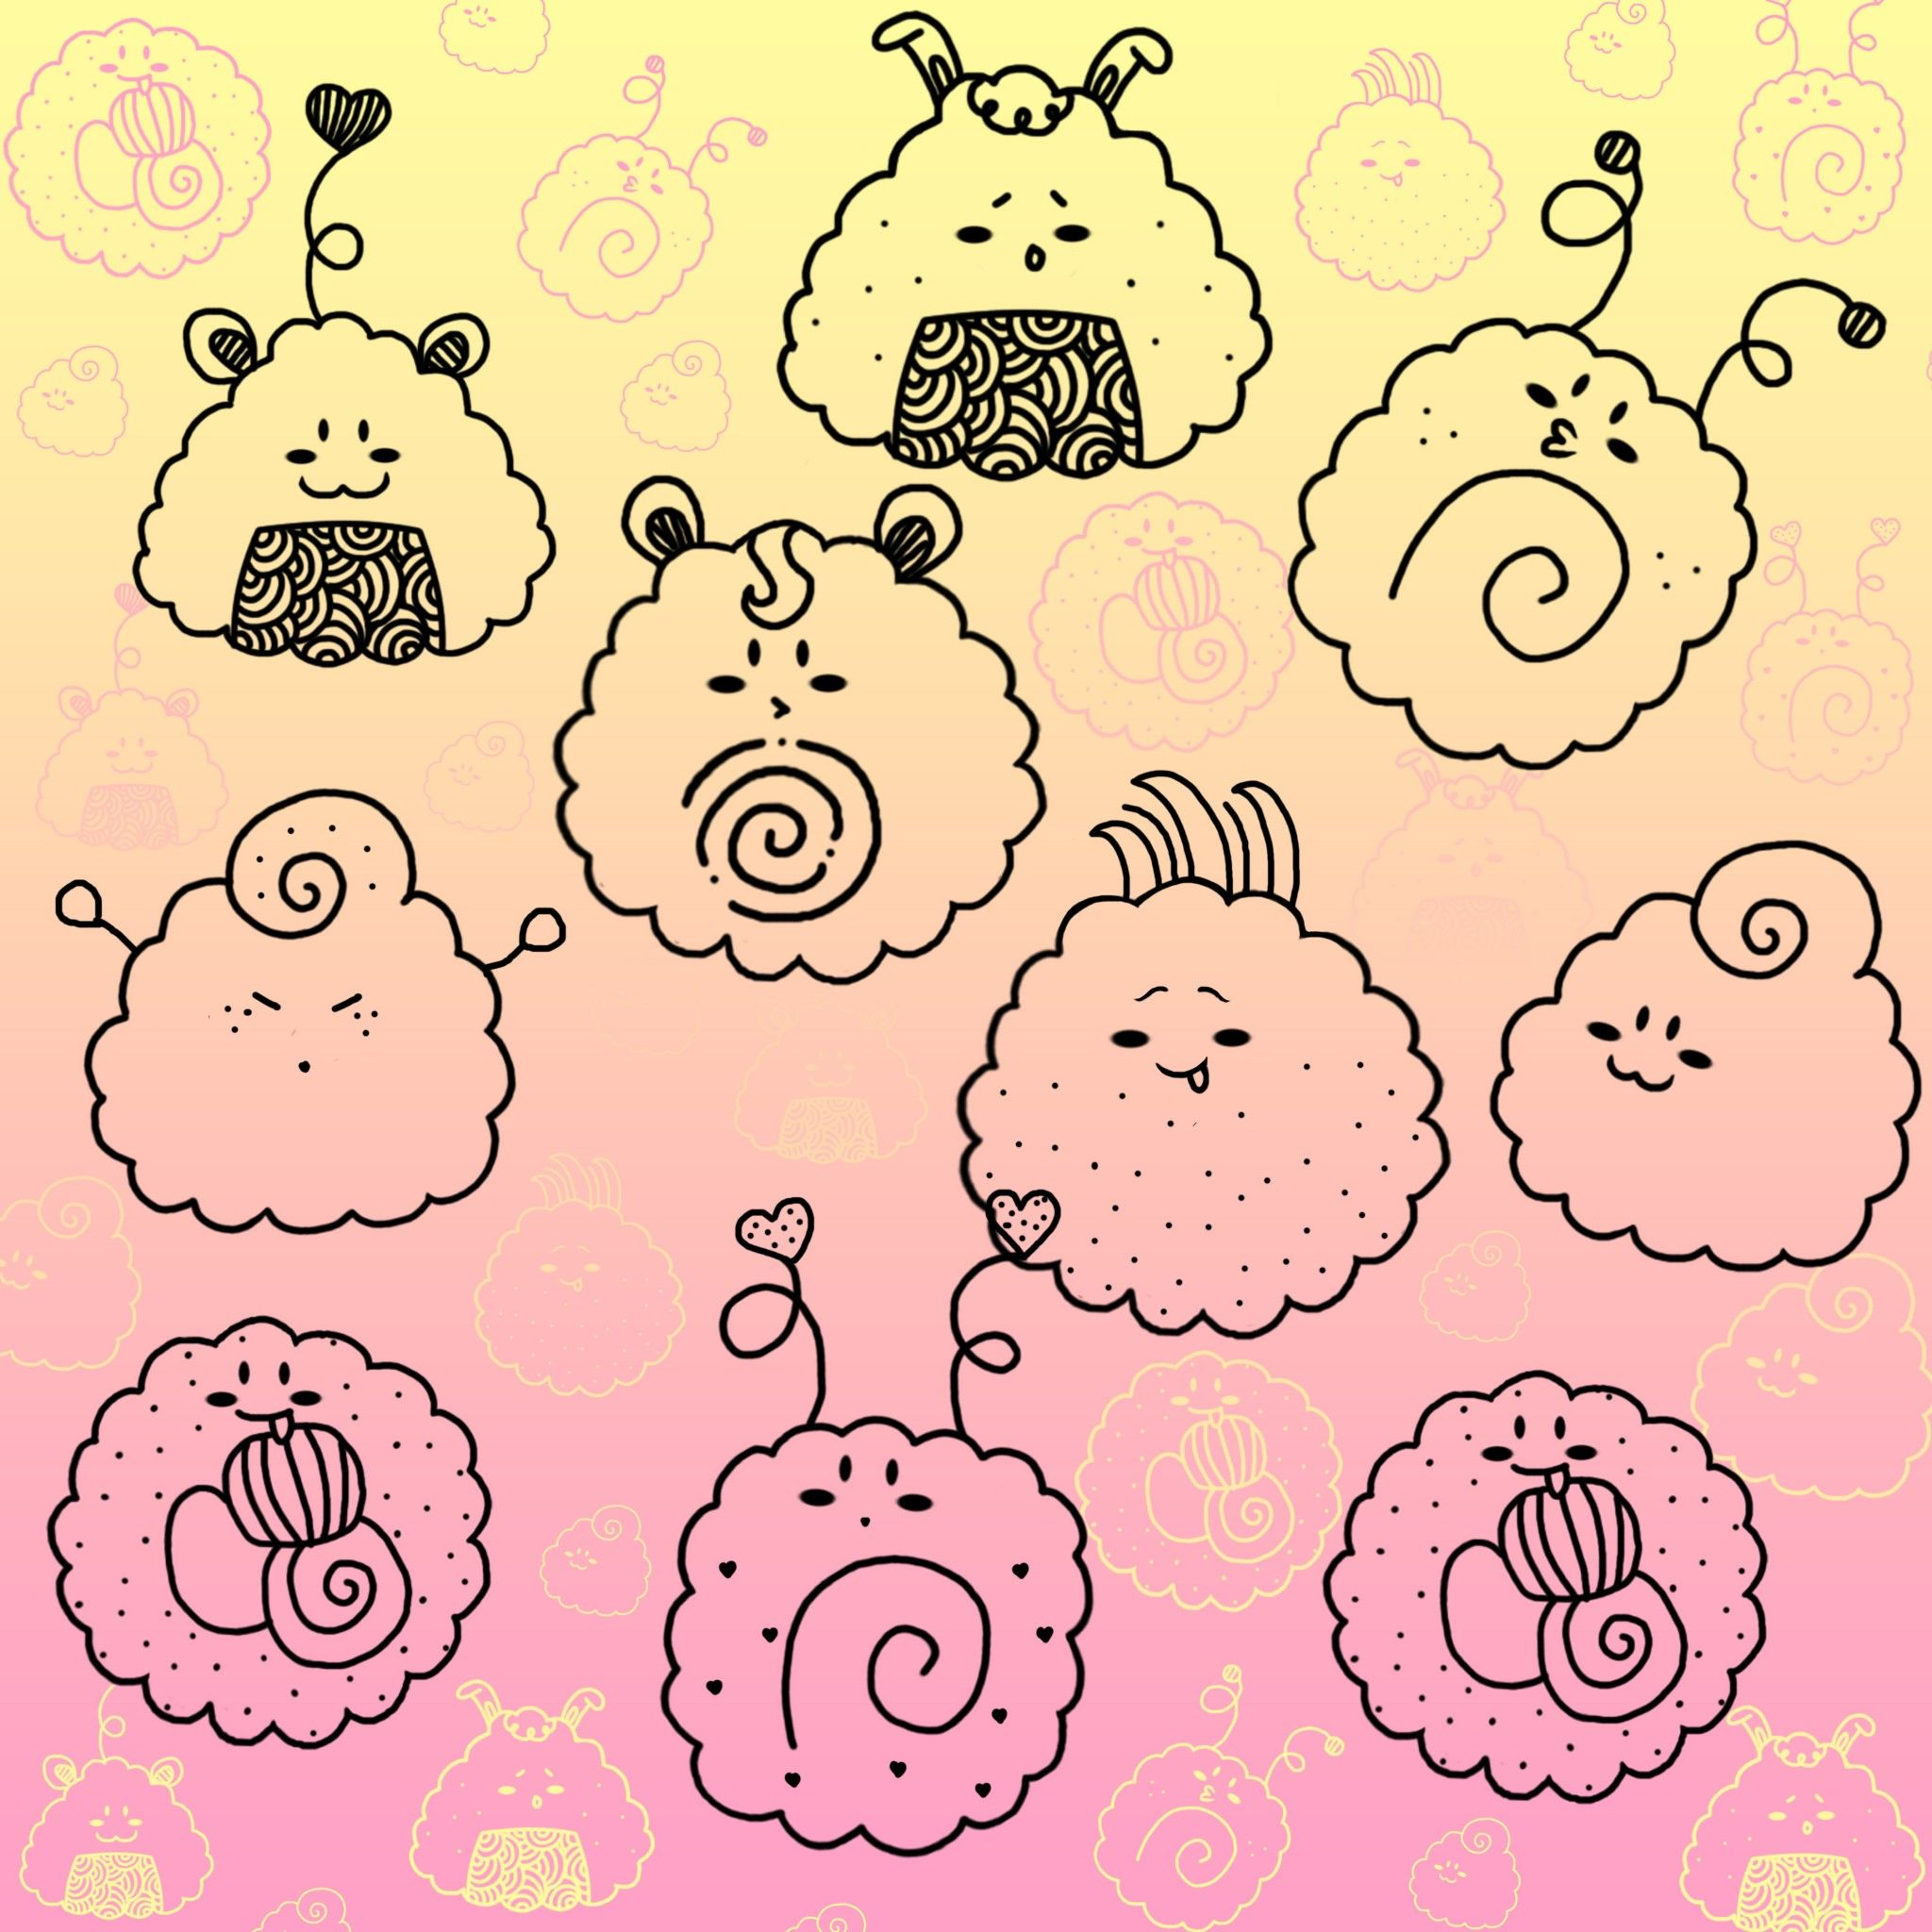 Kawaii Sushi Brushes - Tap to see more cute Kawaii cartoon ...